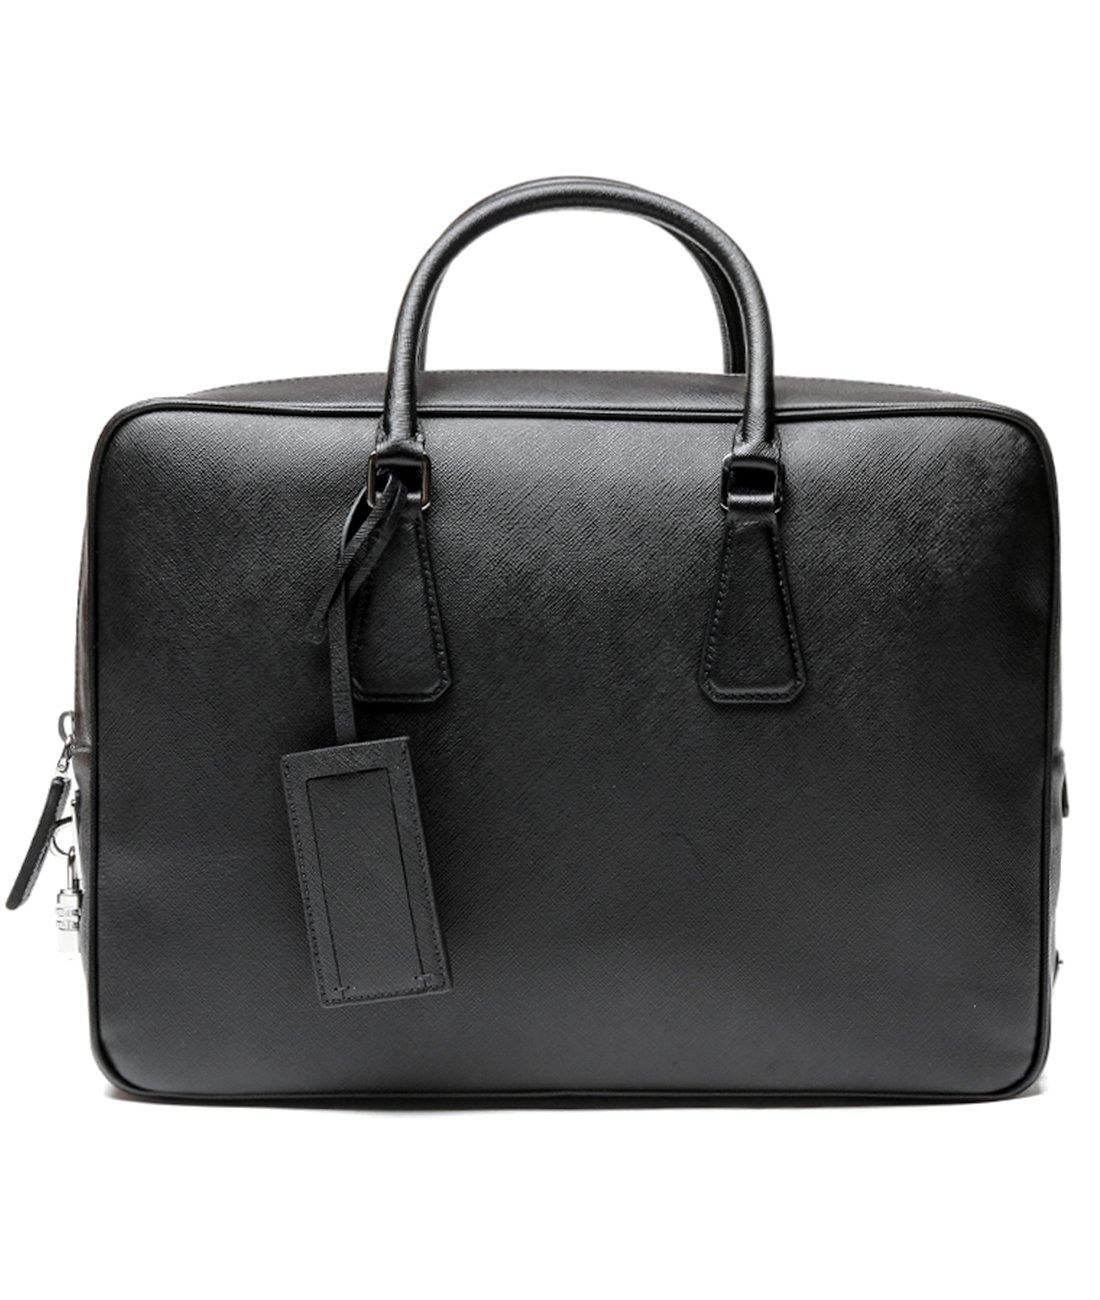 Prada Women's Top Zip Real Leather Handbag One Size Black